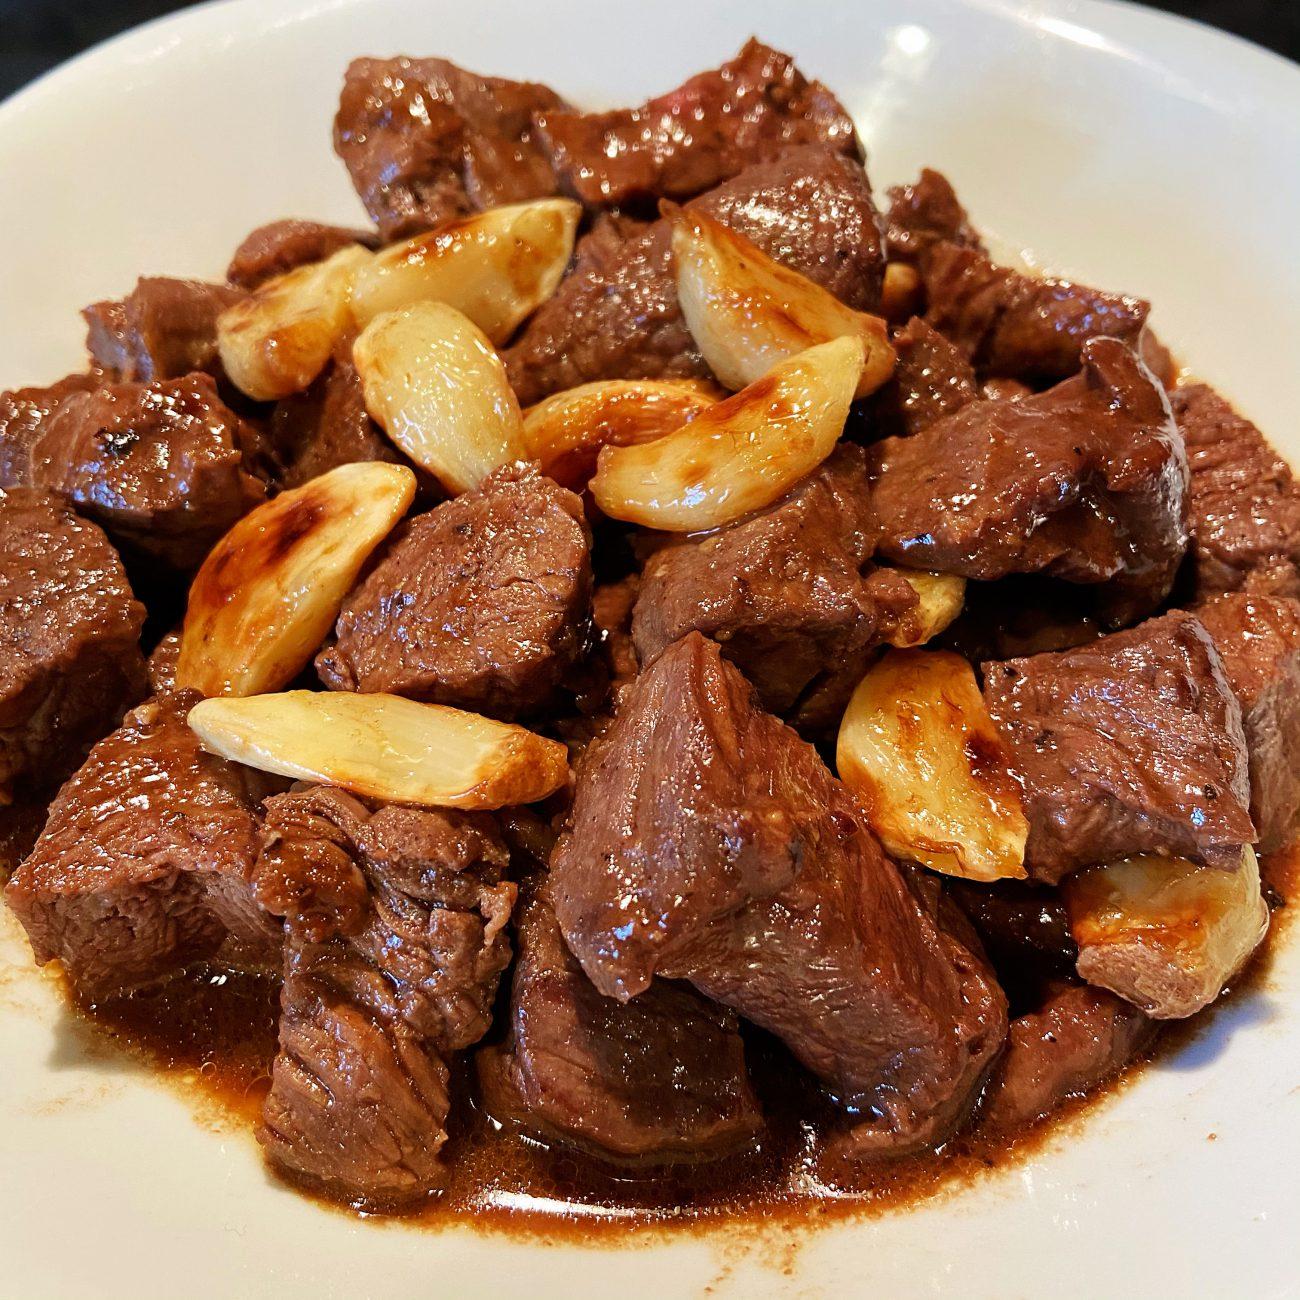 Garlics Grilled Beef Tenderloin With Black Pepper Sauce